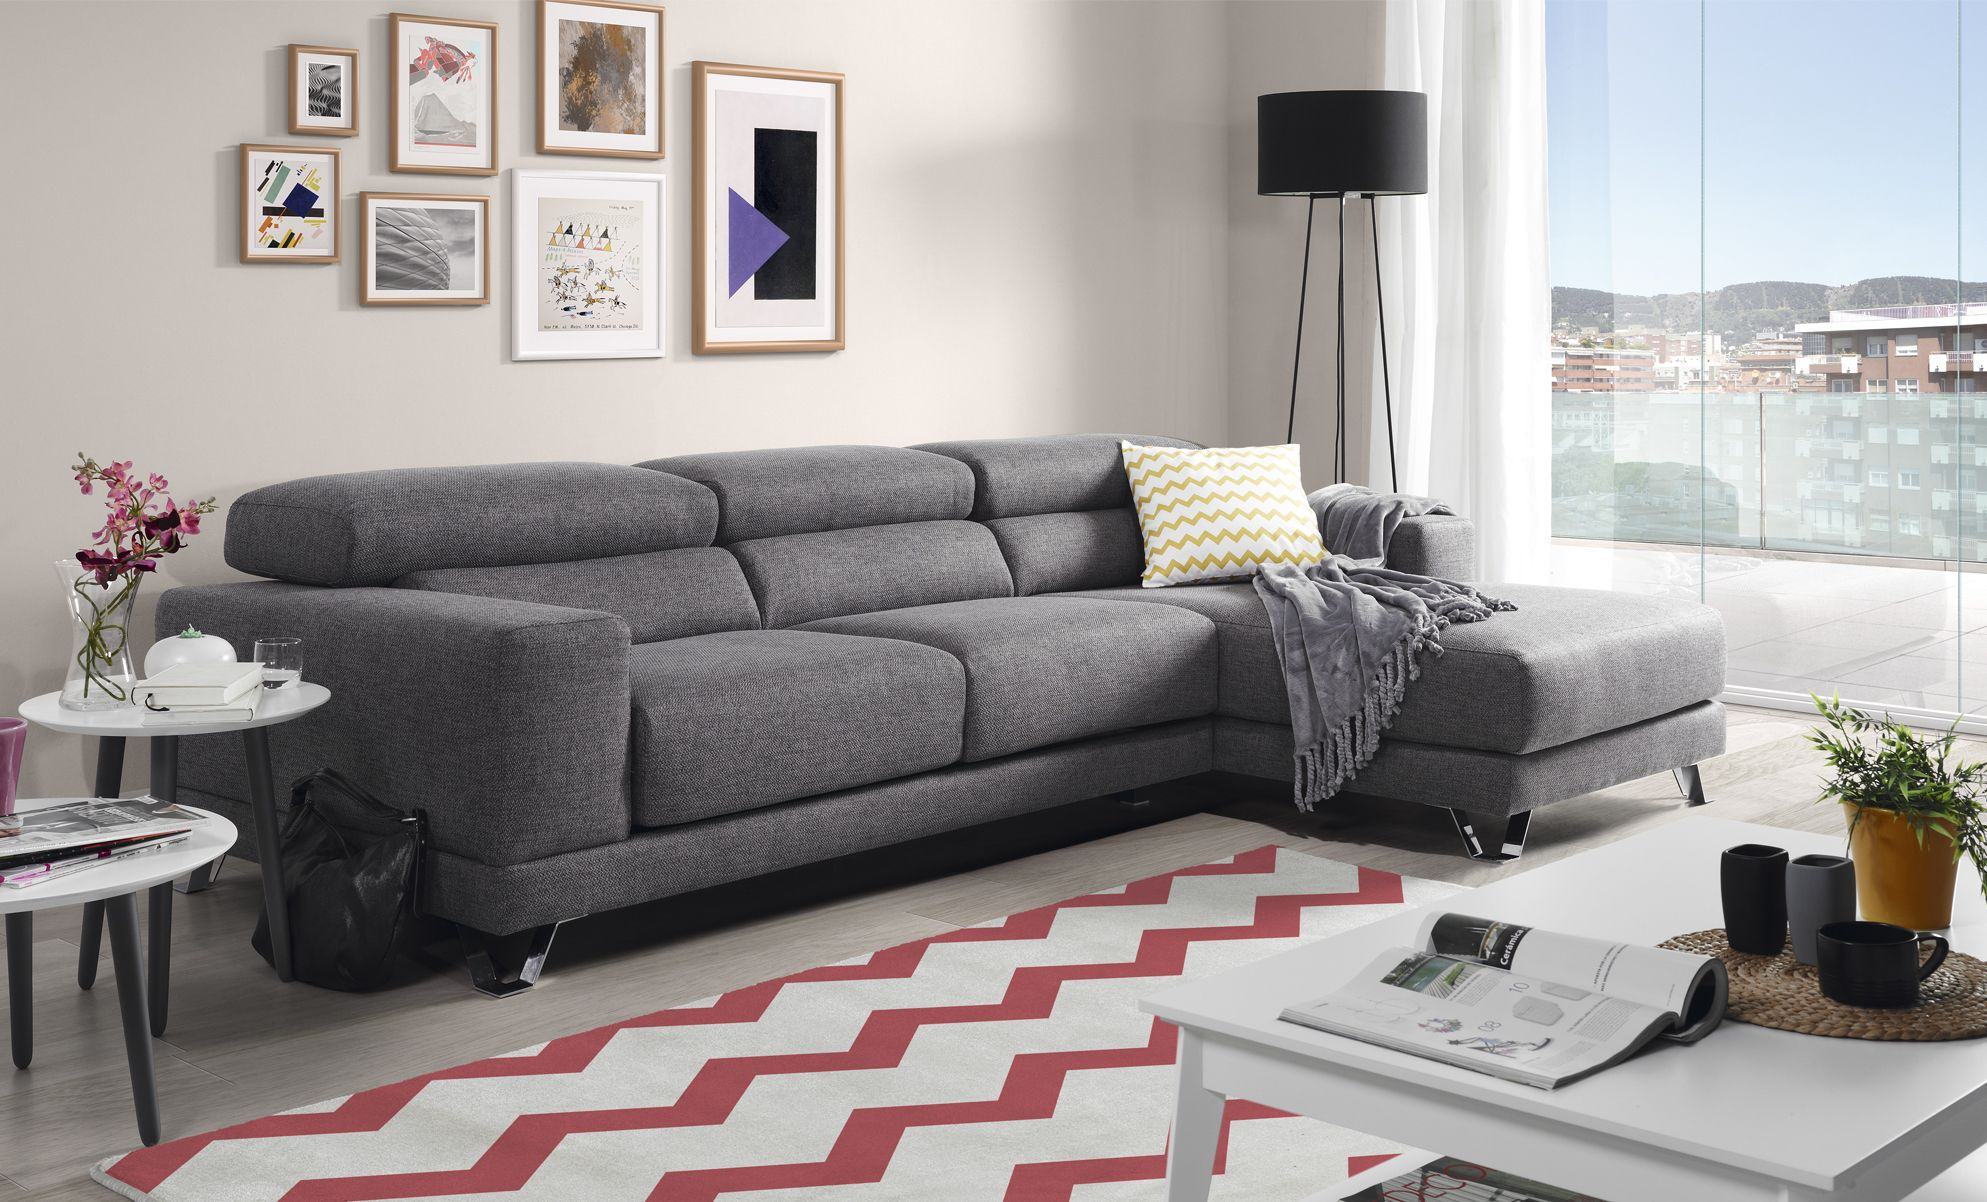 Kibuc muebles y complementos sof s maui sof s de for Sofas pequenos y comodos